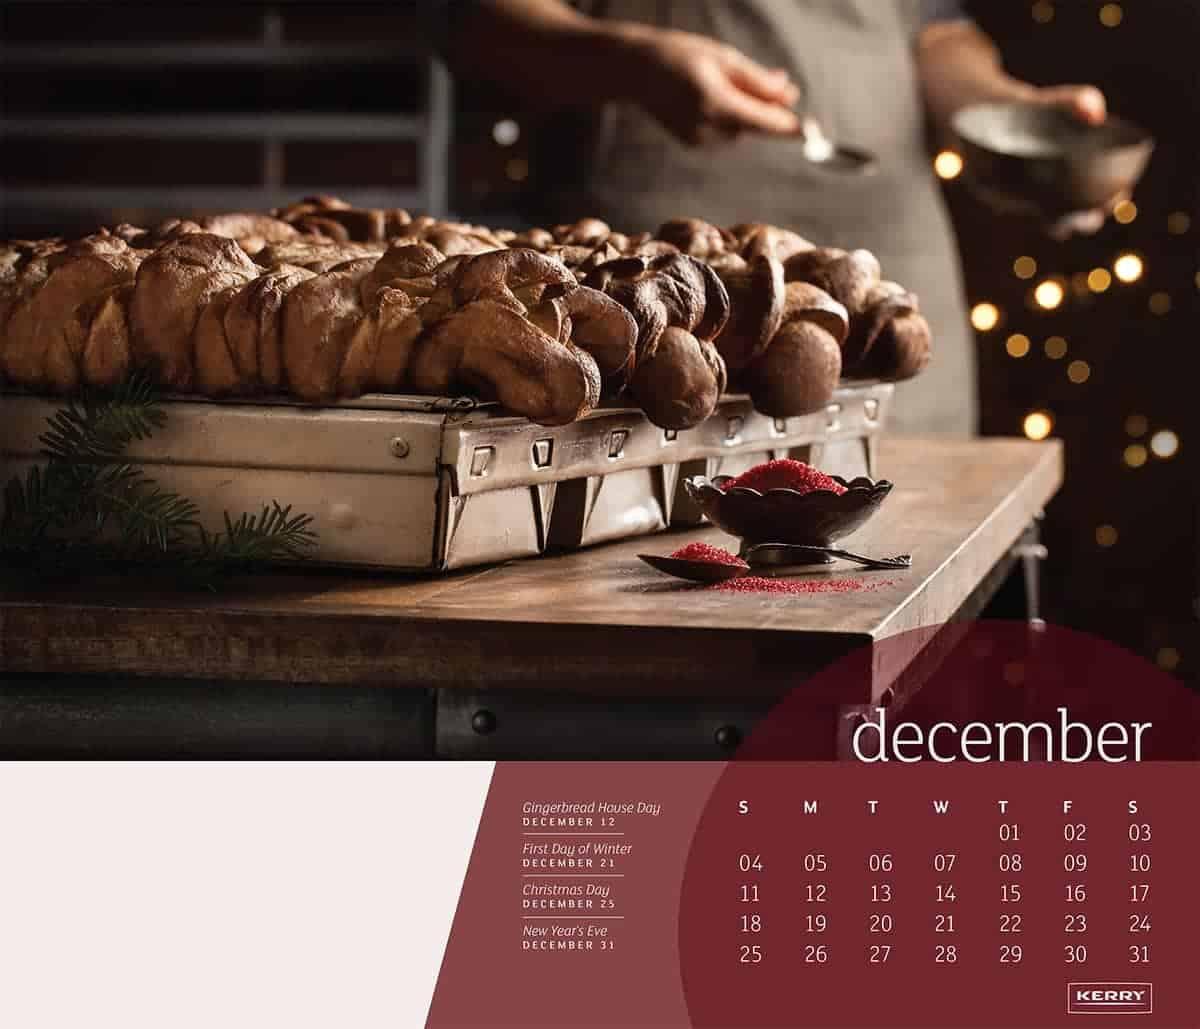 2016 Kerry Holiday Calendar_Jena Carlin Photography_96-14